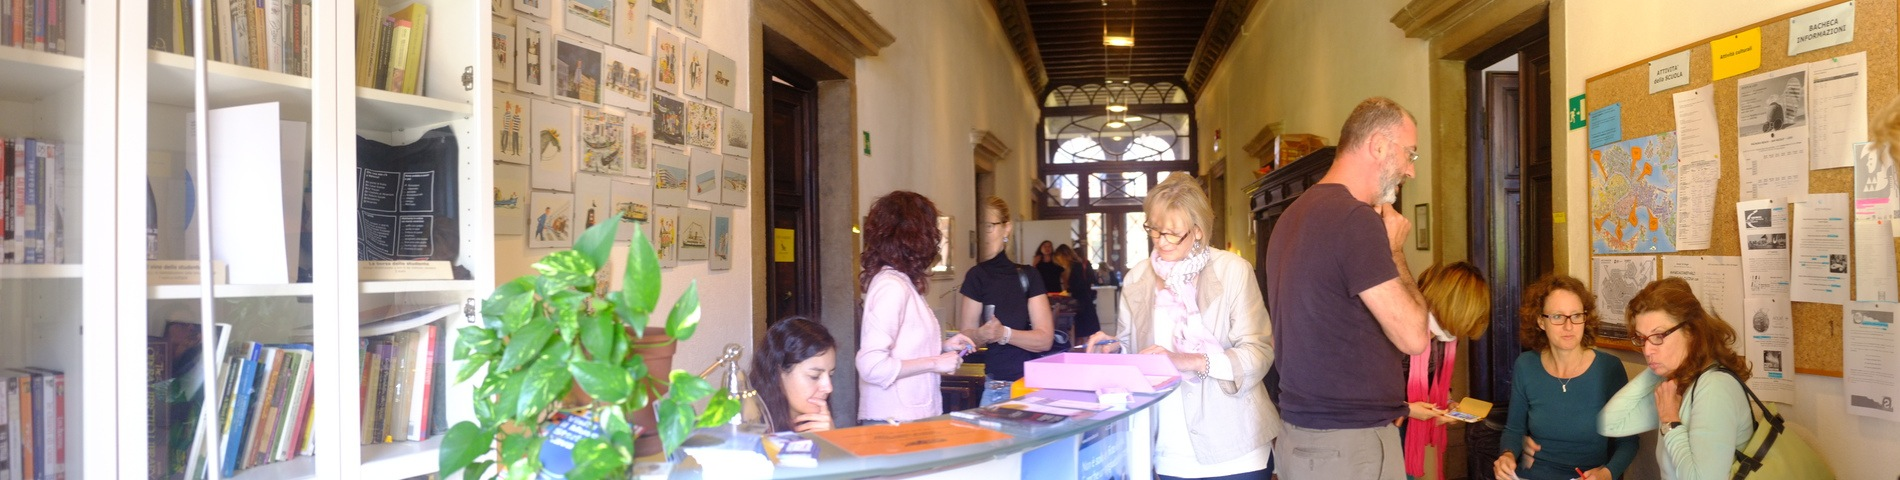 Venice Language School obrazek 1